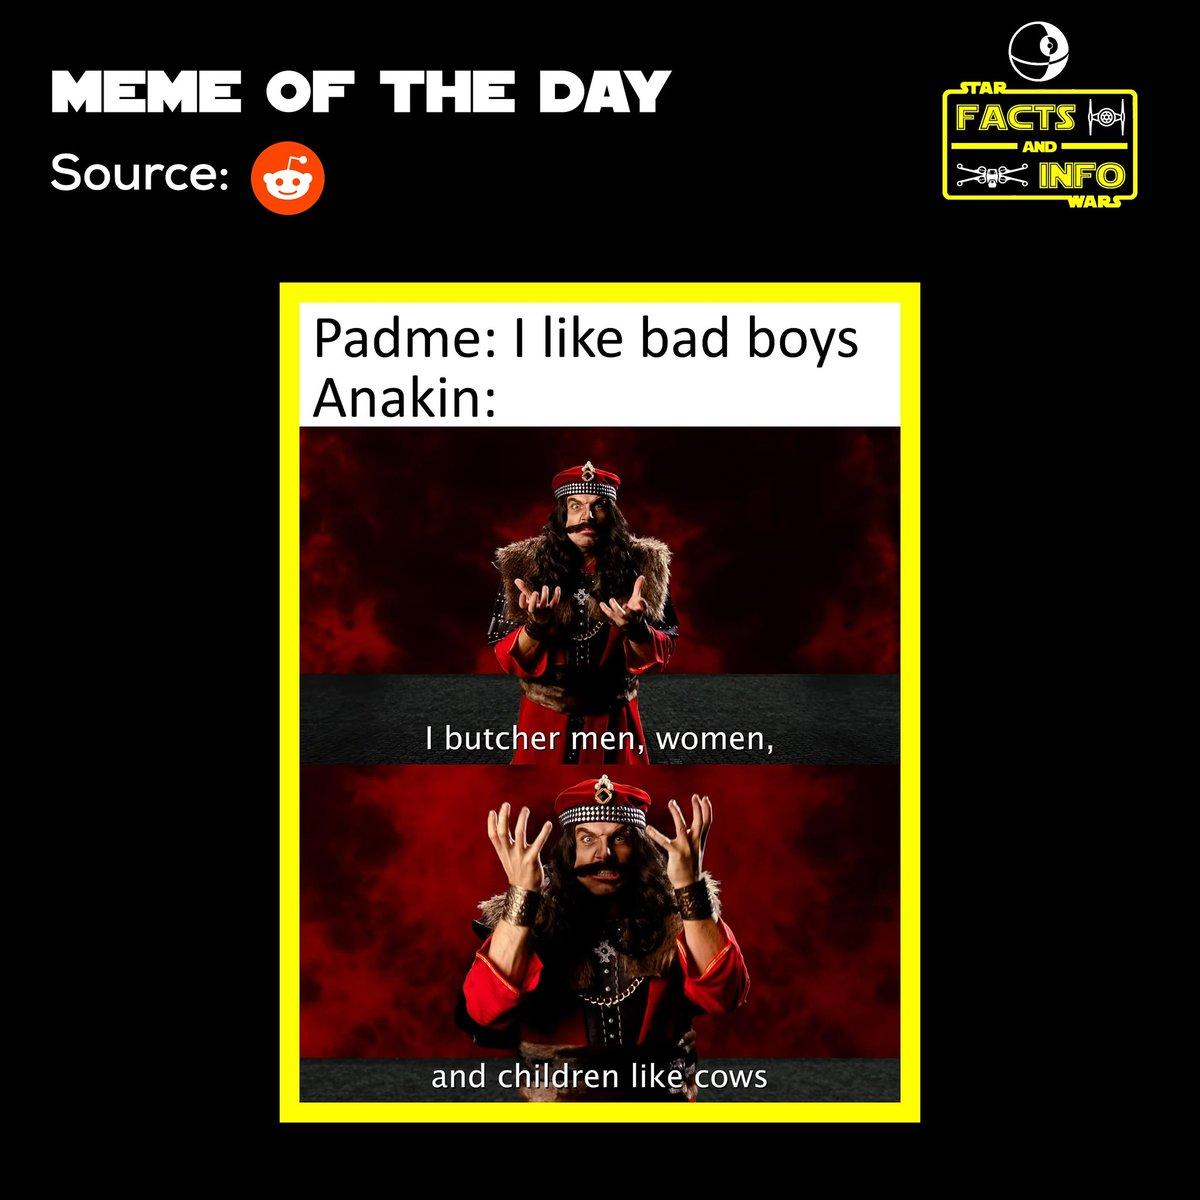 Meme of the Day  #starwars #starwarsmeme #eastarwars #meme #memeoftheday #swgoh #galaxyofheroes #anakinskywalker #padmeamidala #obiwankenobi #jedi #jedipurge #sand #tatooine #sandpeople #tusken #tuskenraider #theclonewars #reddit #funnypic.twitter.com/YkRwKUvwK7